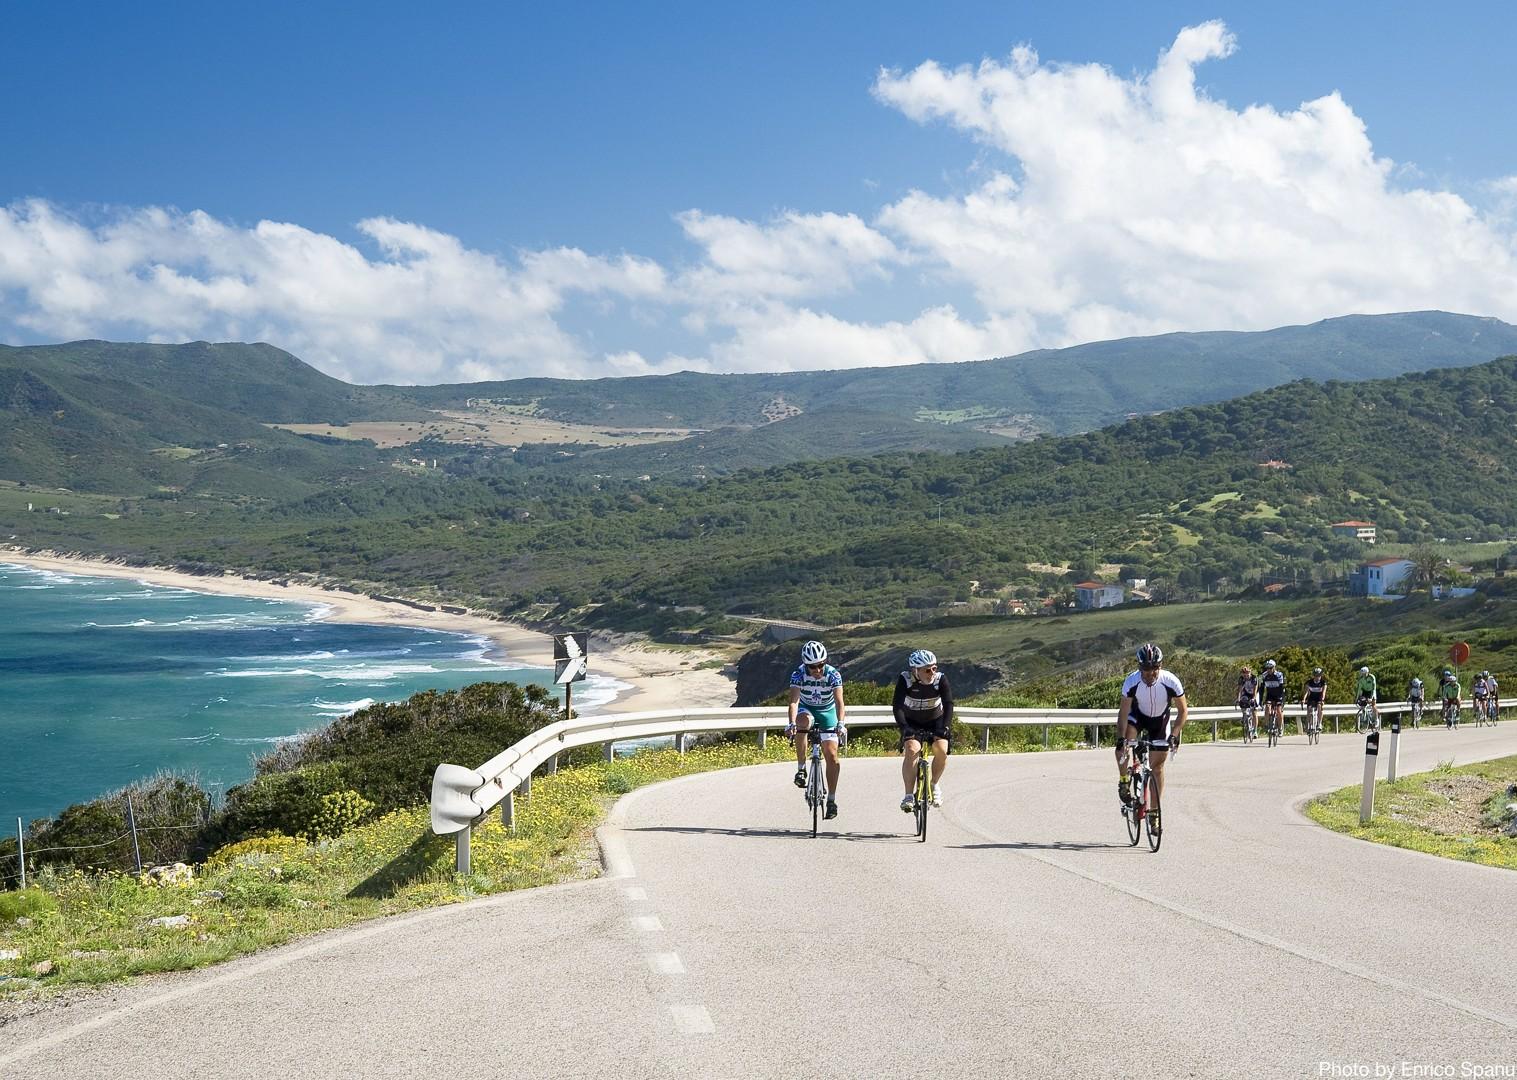 Road-Cycling-Holiday-Coastal-Explorer-Sardinia-Italy.jpg - Italy - Sardinia - Coastal Explorer - Road Cycling